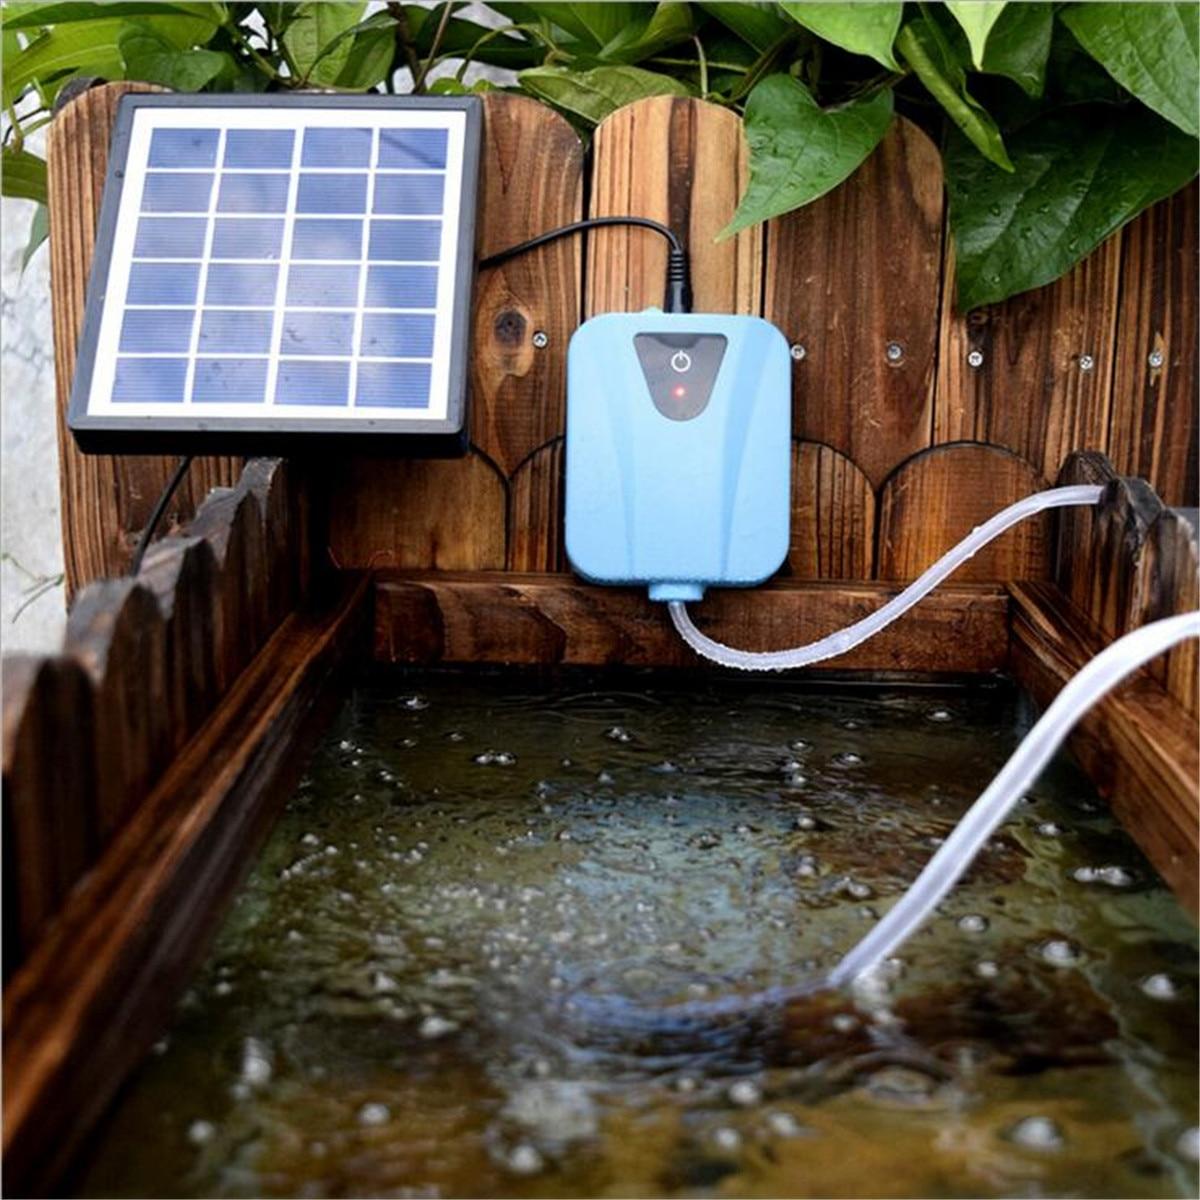 ZHIYANG Solar Powered Panel Air Oxygenator Pond Fish Tank Water Garden Air Pump Outdoorc Metal+Plastic